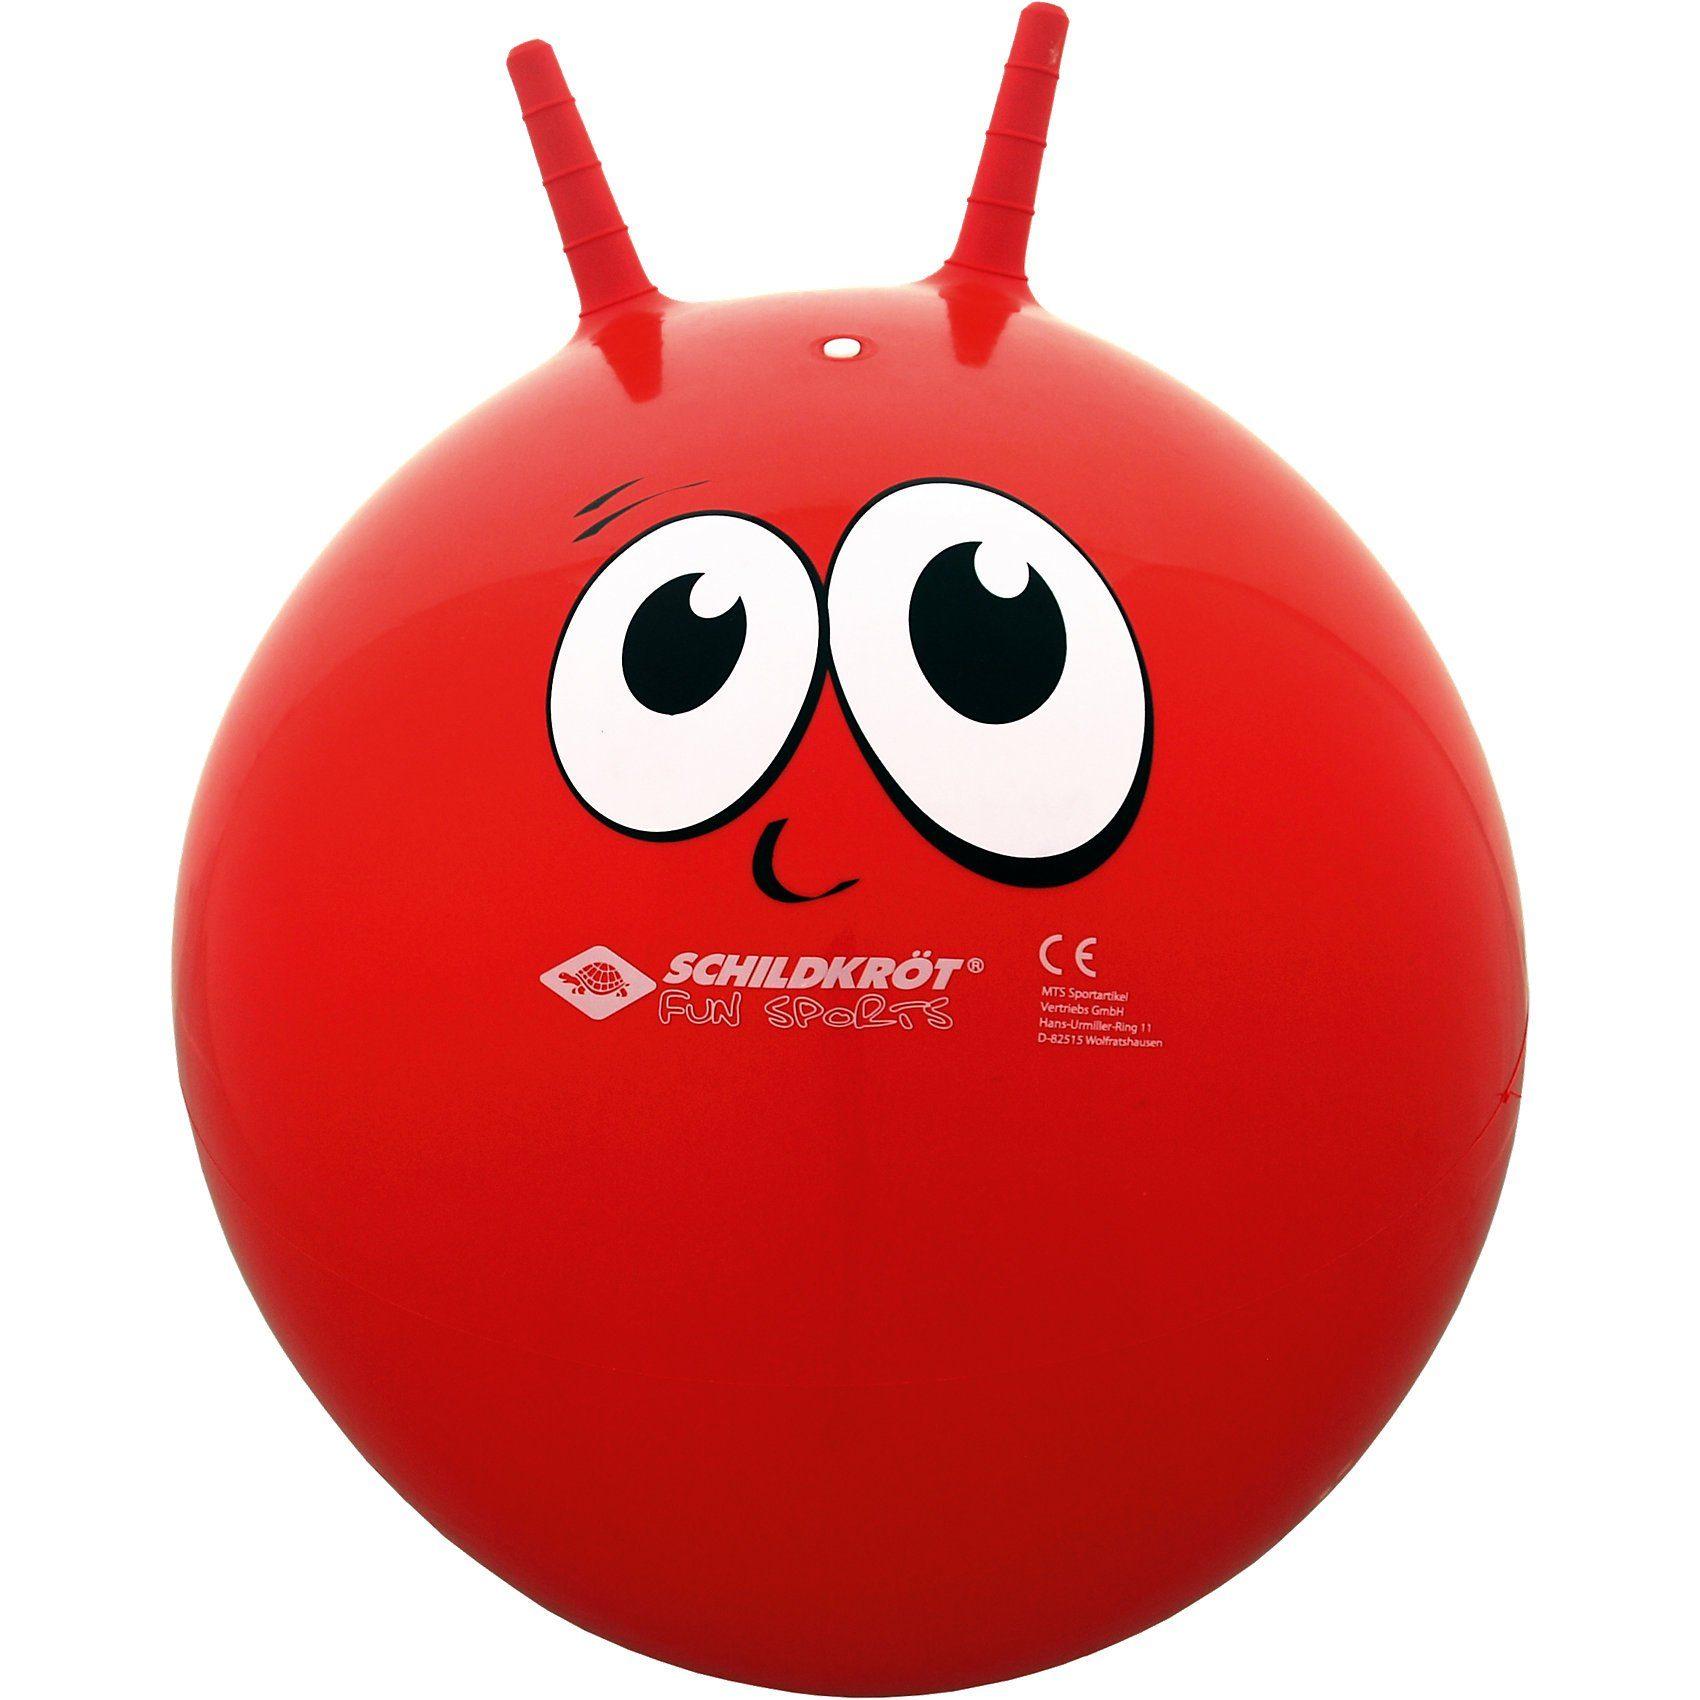 Schildkröt Funsports Hüpfball / Sprungball mit Griffen